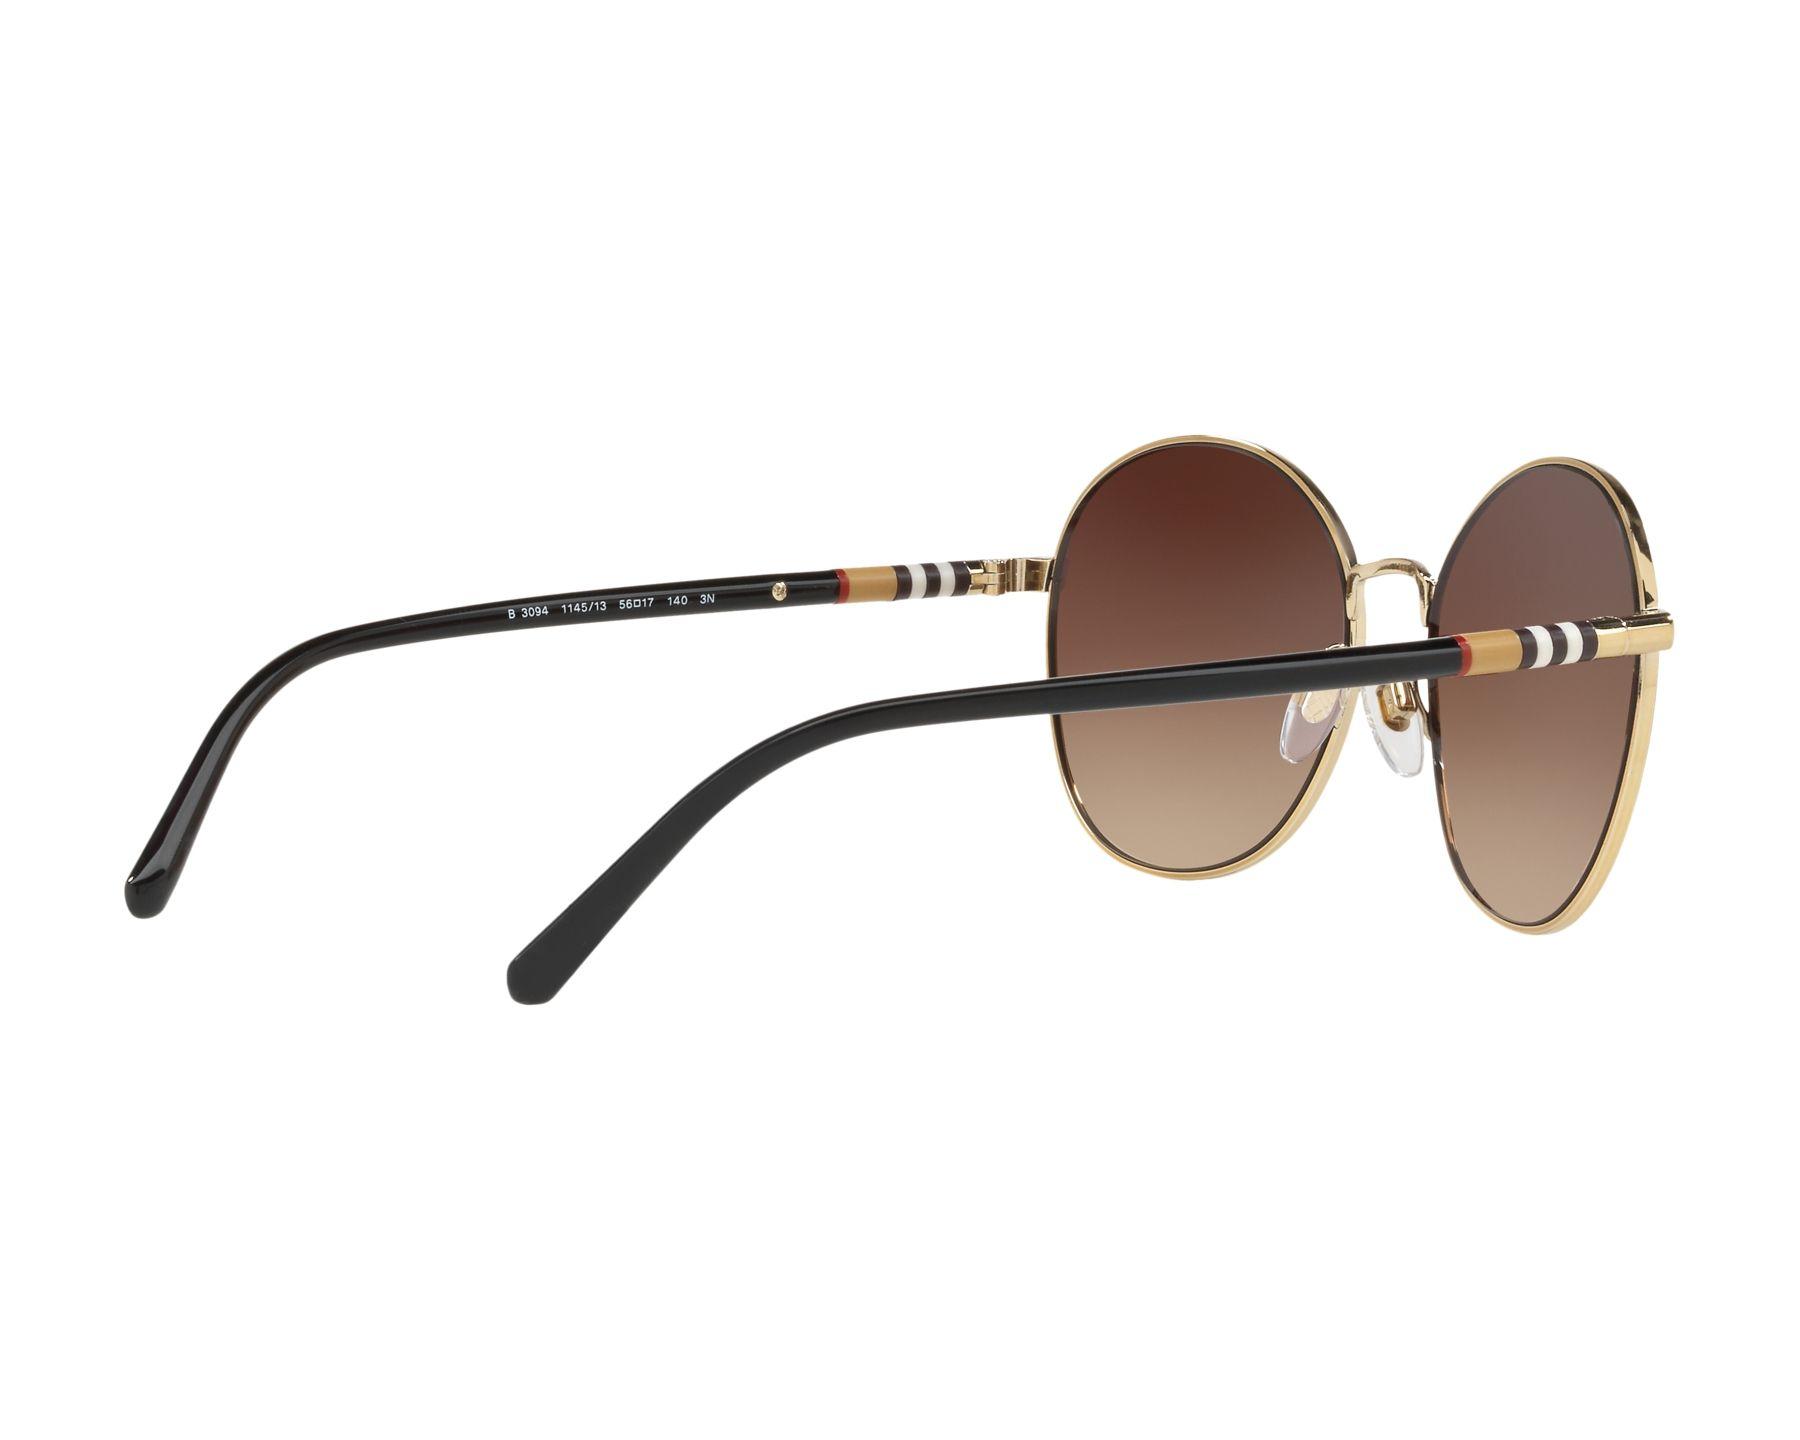 a7a3e14a458 Sunglasses Burberry BE-3094 114513 56-17 Black Gold 360 degree view 9